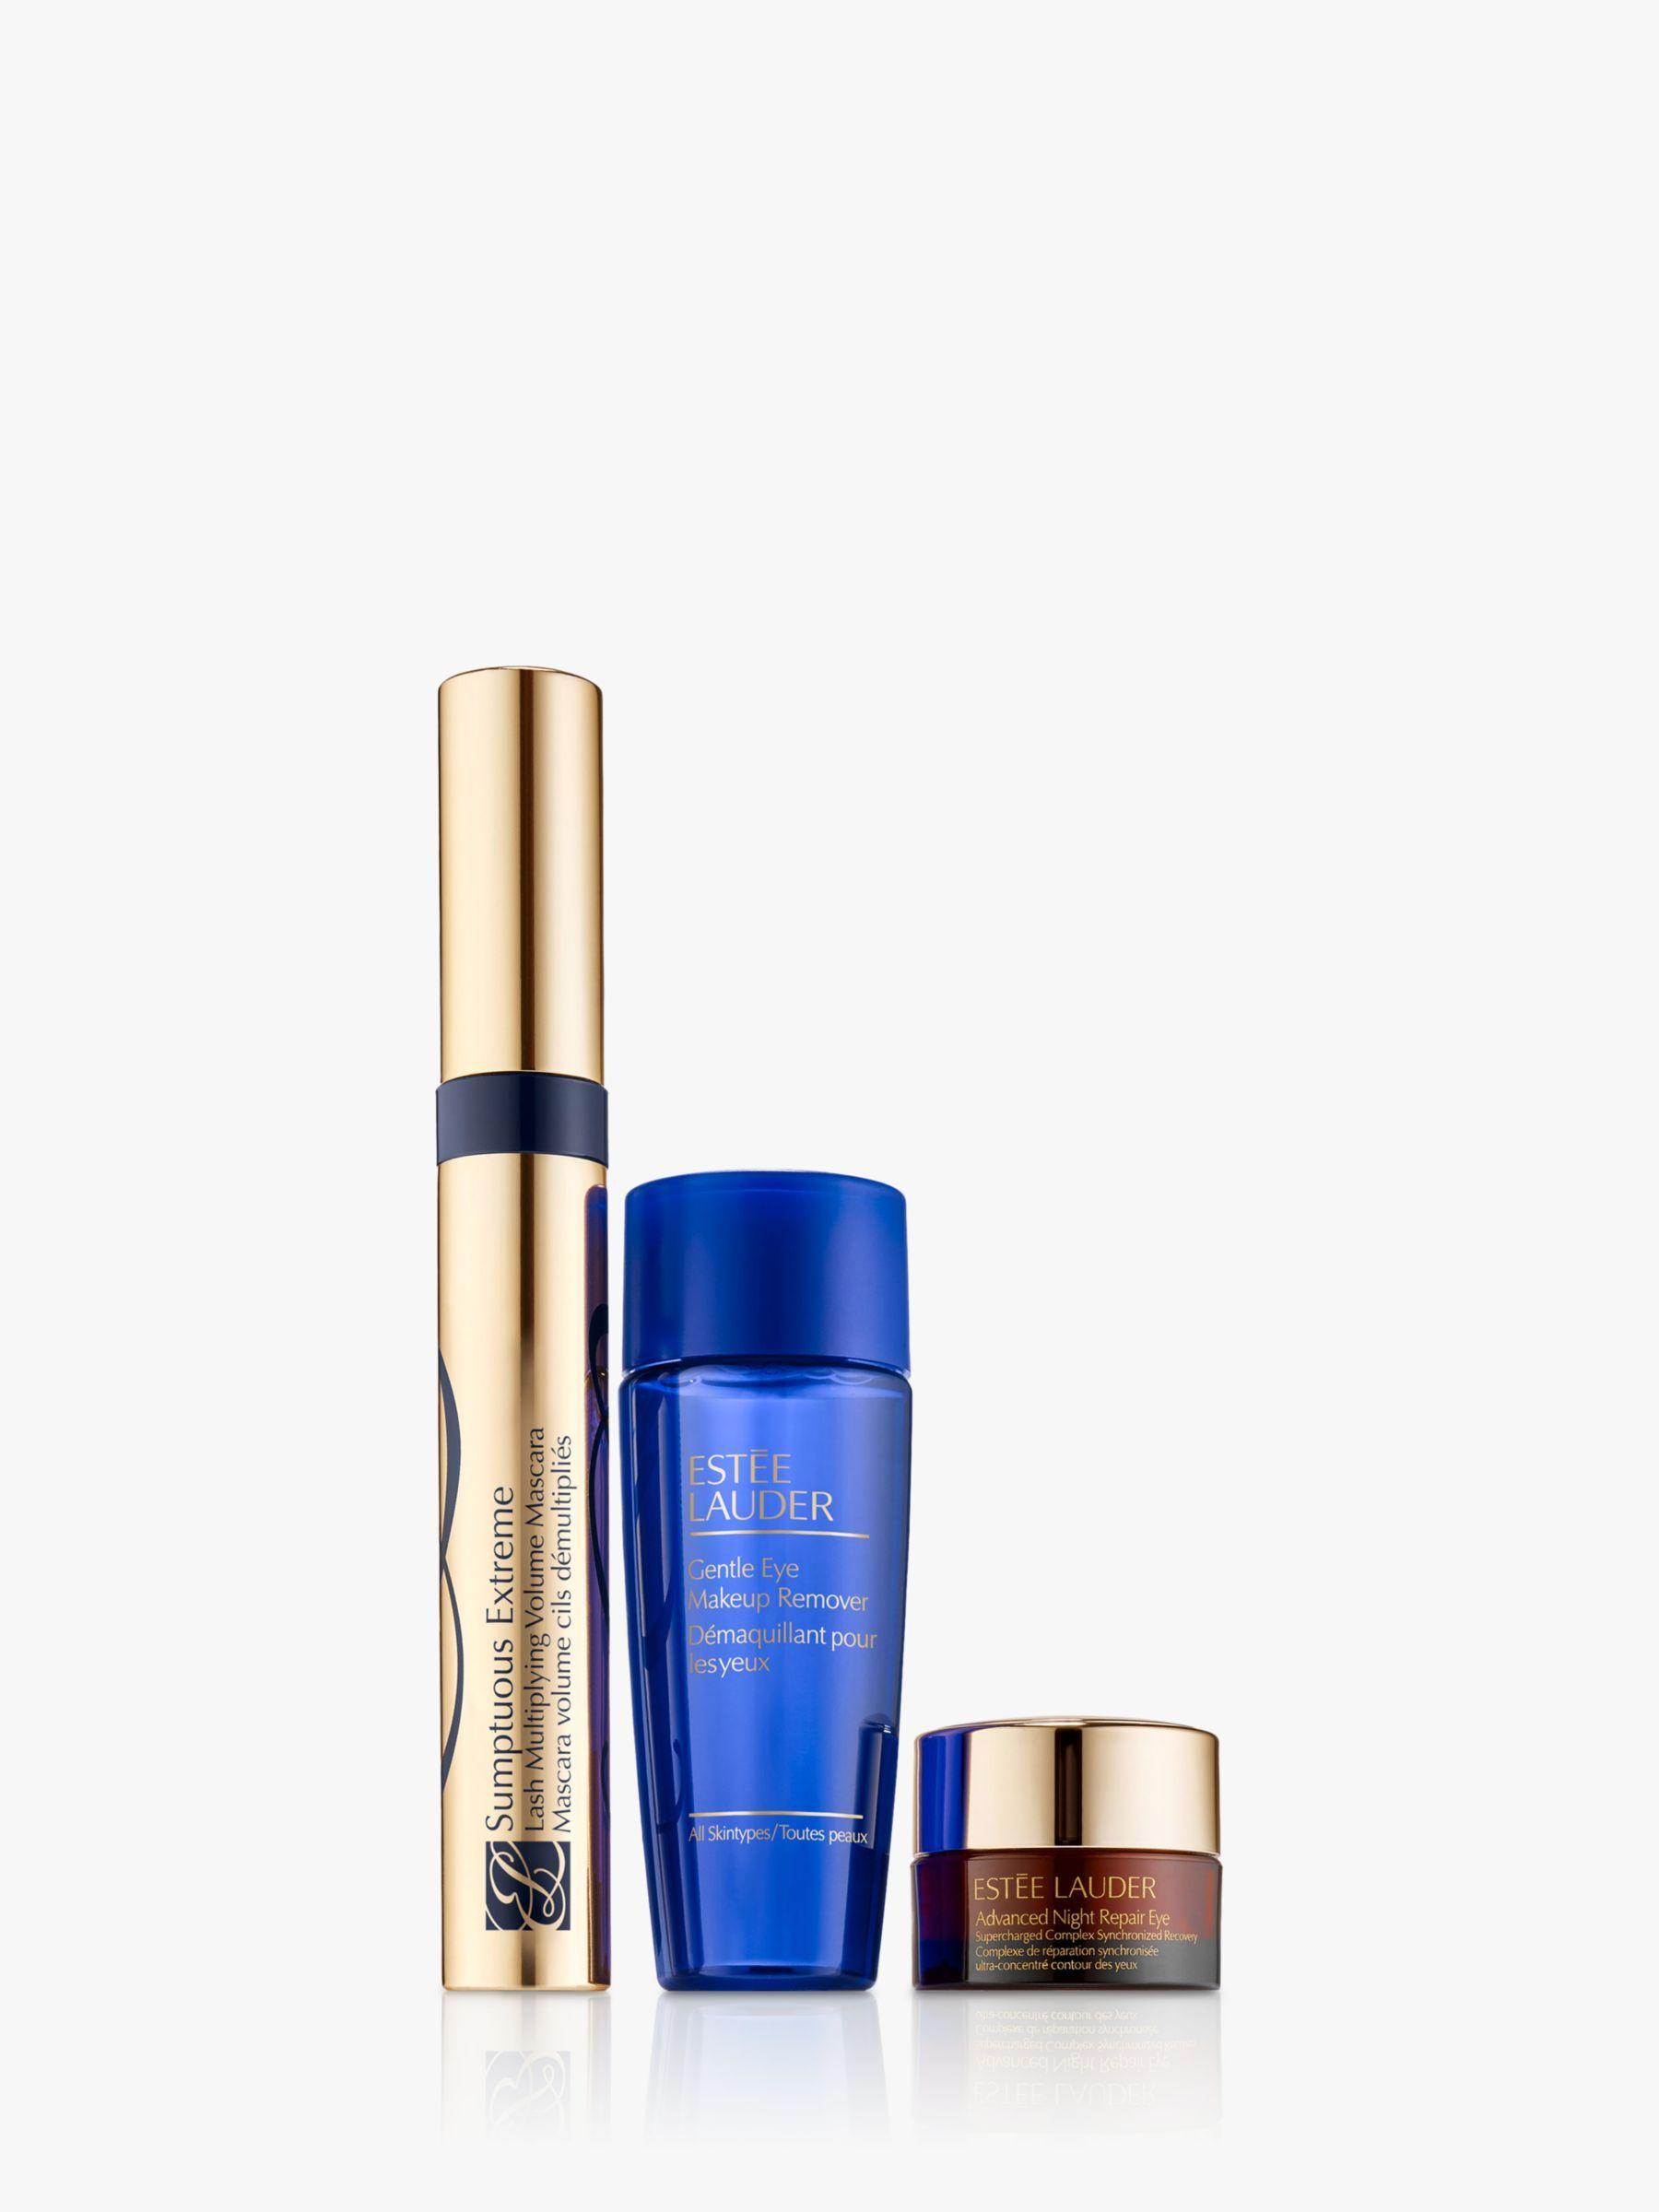 Estée Lauder Mascara Essentials Makeup Gift Set in 2020